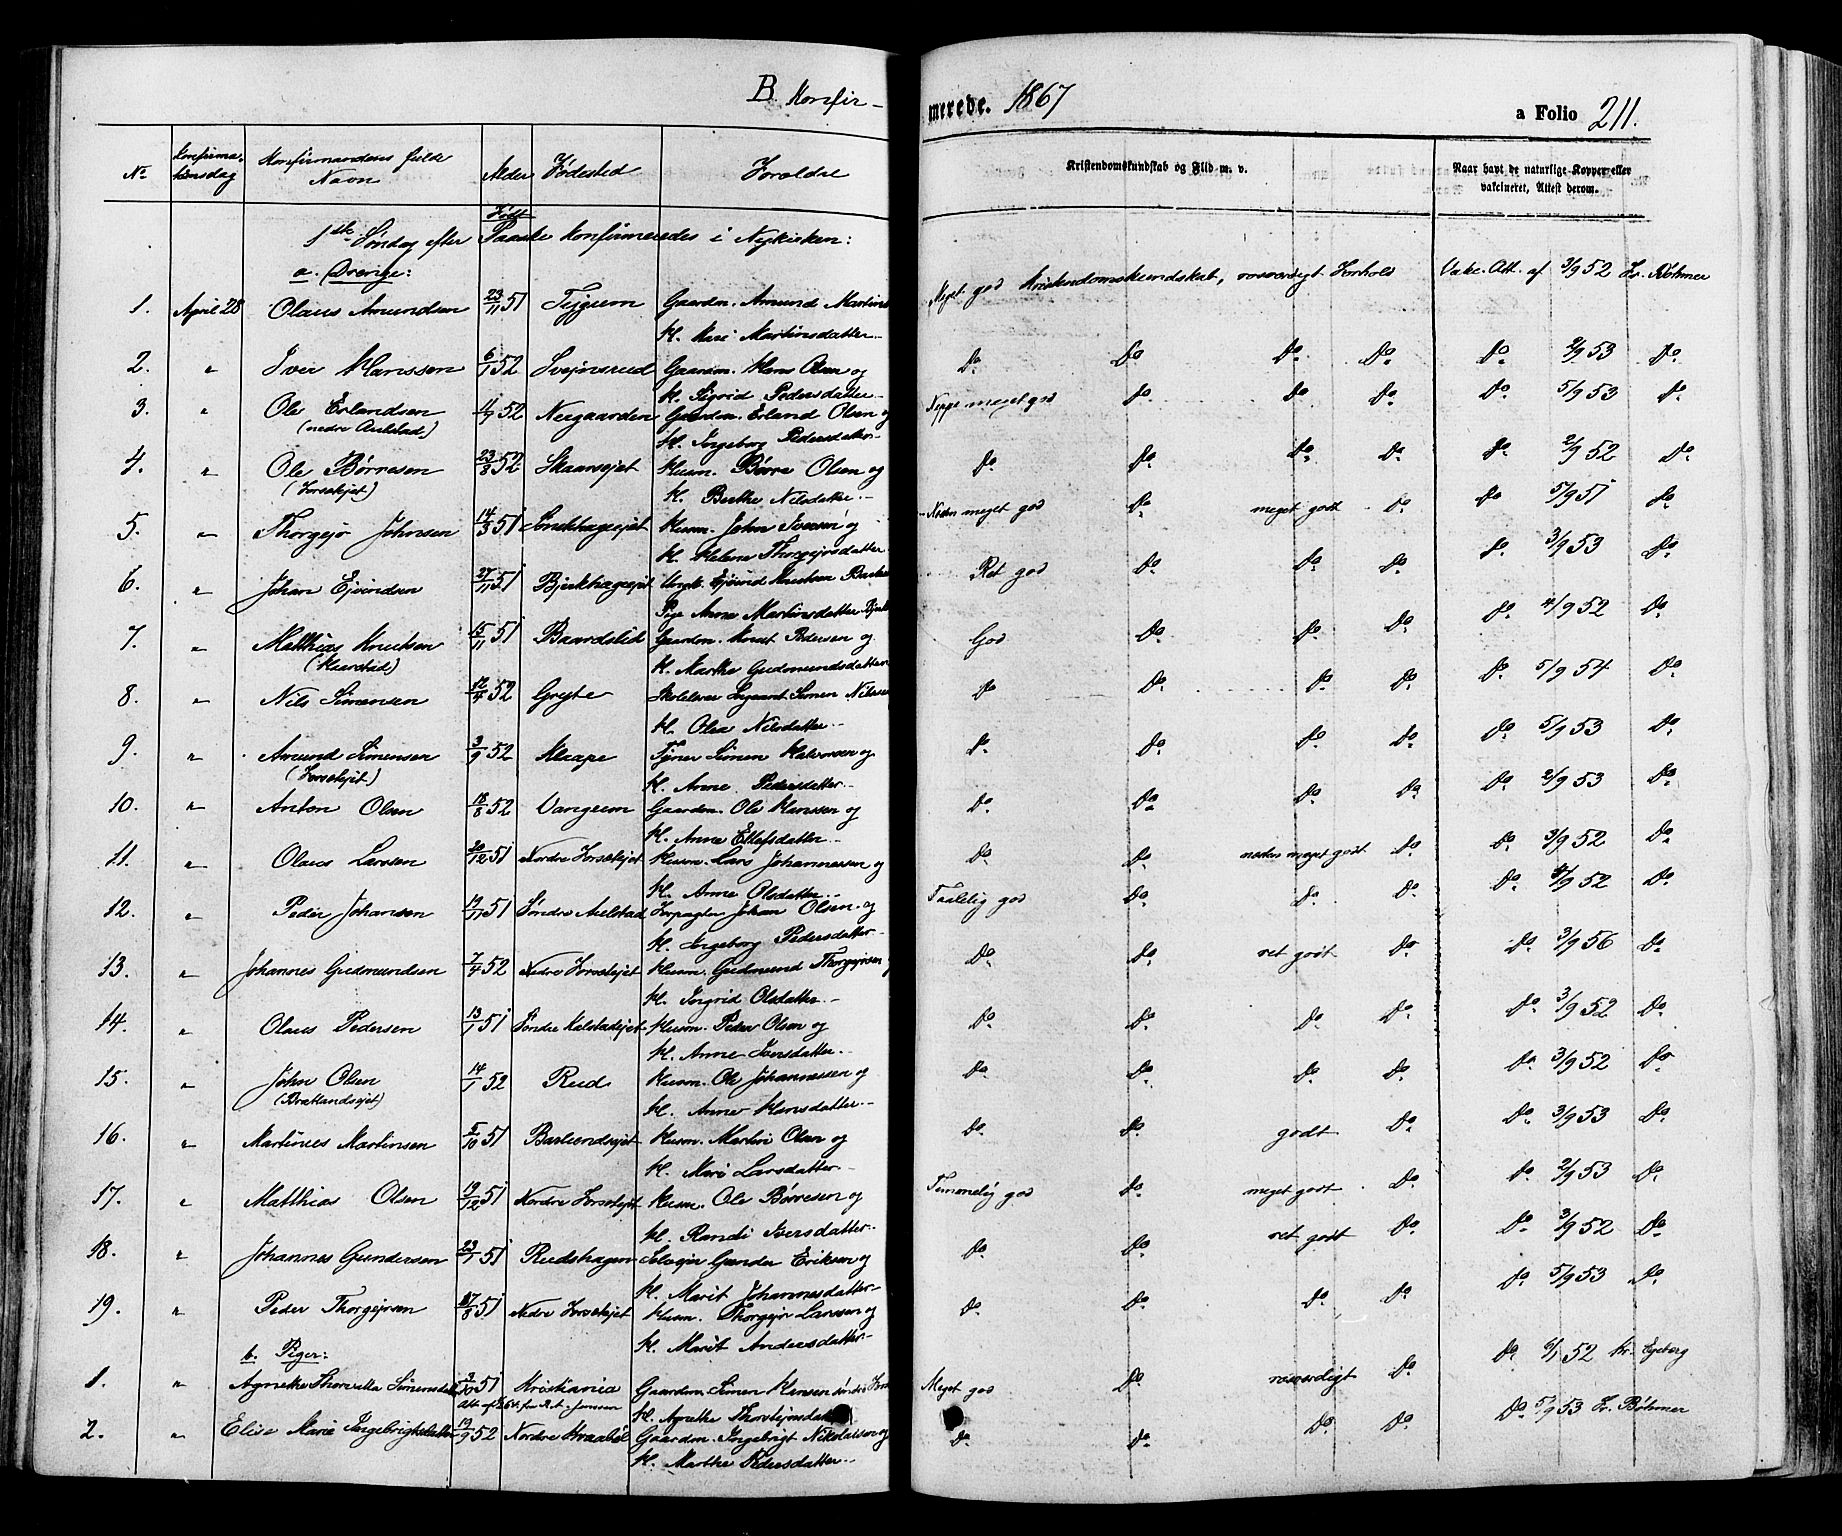 SAH, Gausdal prestekontor, Ministerialbok nr. 10, 1867-1886, s. 211